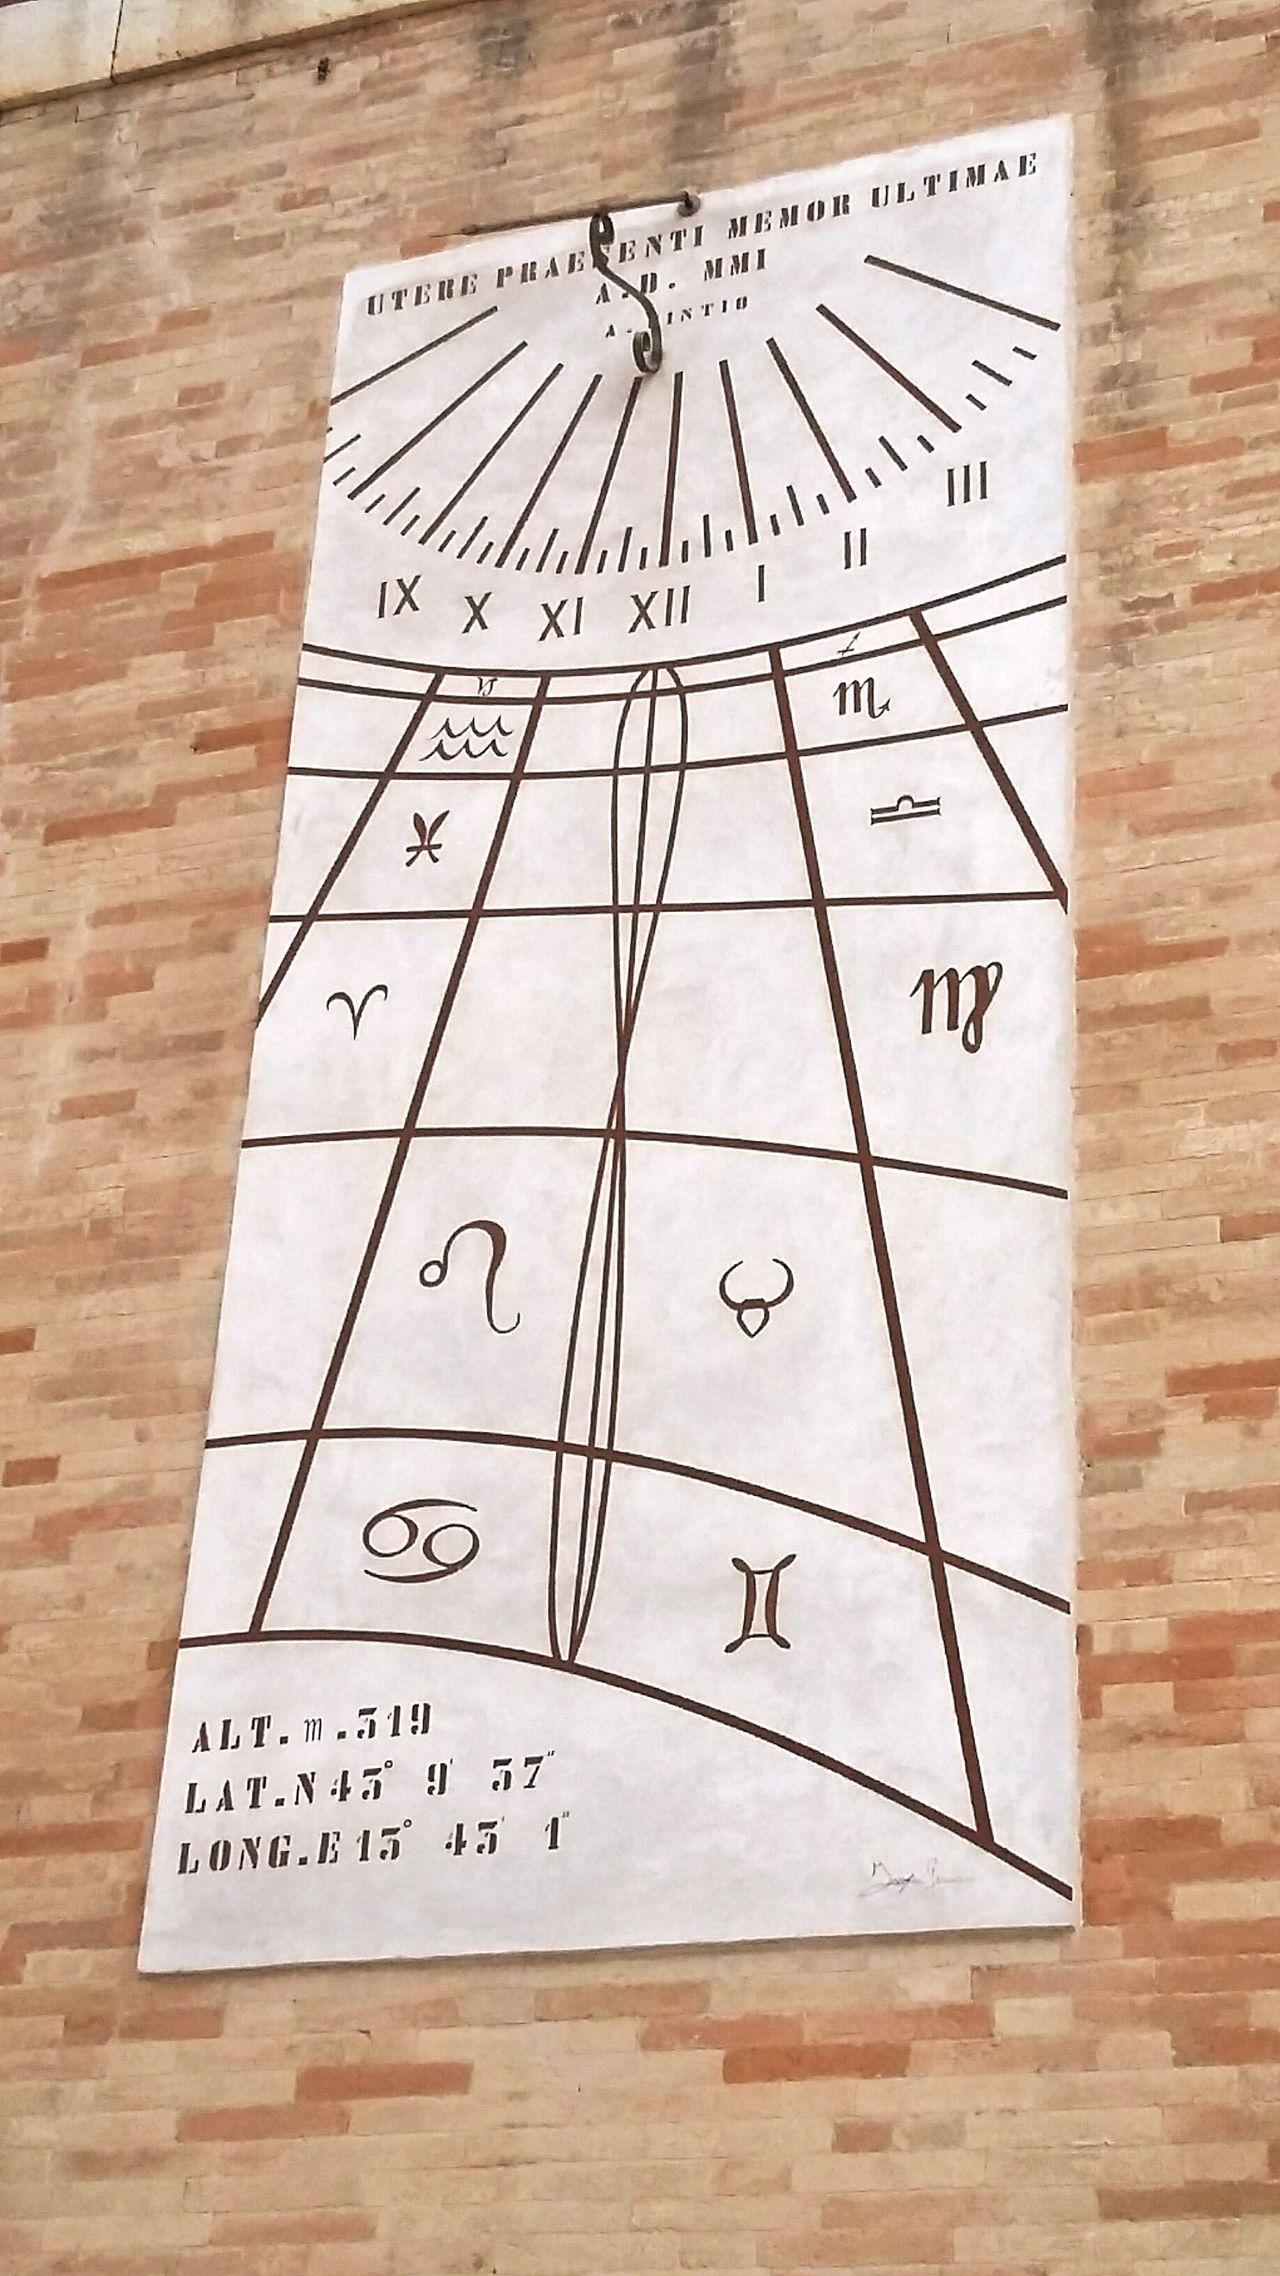 Zodiac Fermo Fermo Italy Mura Antico Zodiaco Zodiac Photography Zodiacsigns EyeEmNewHere